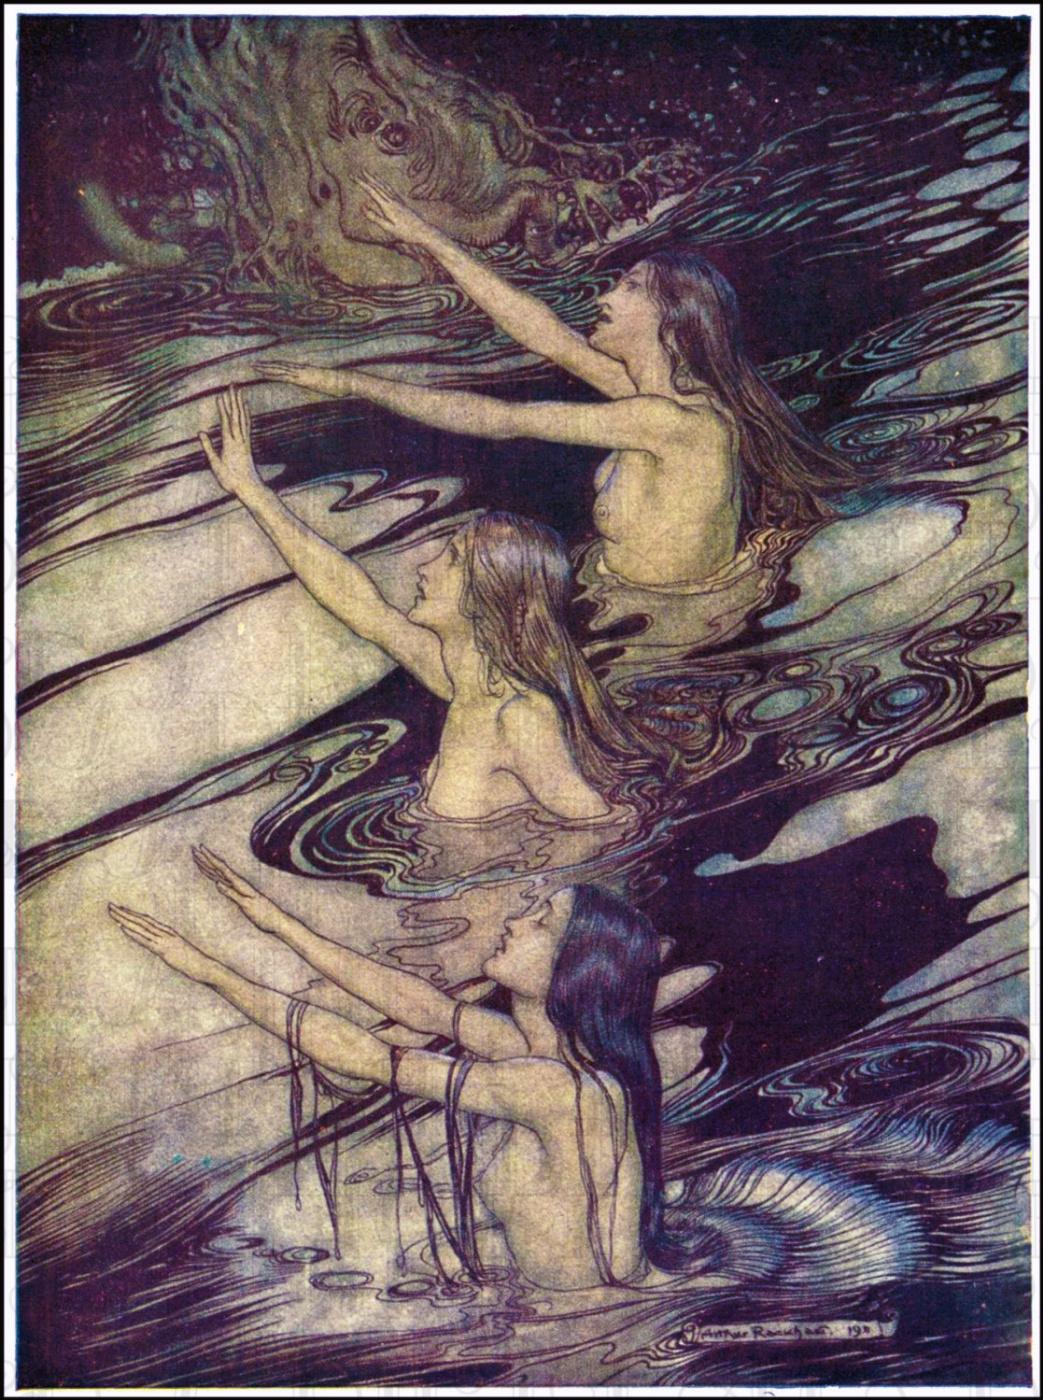 Arthur Rackham. The Gold of the Rhine